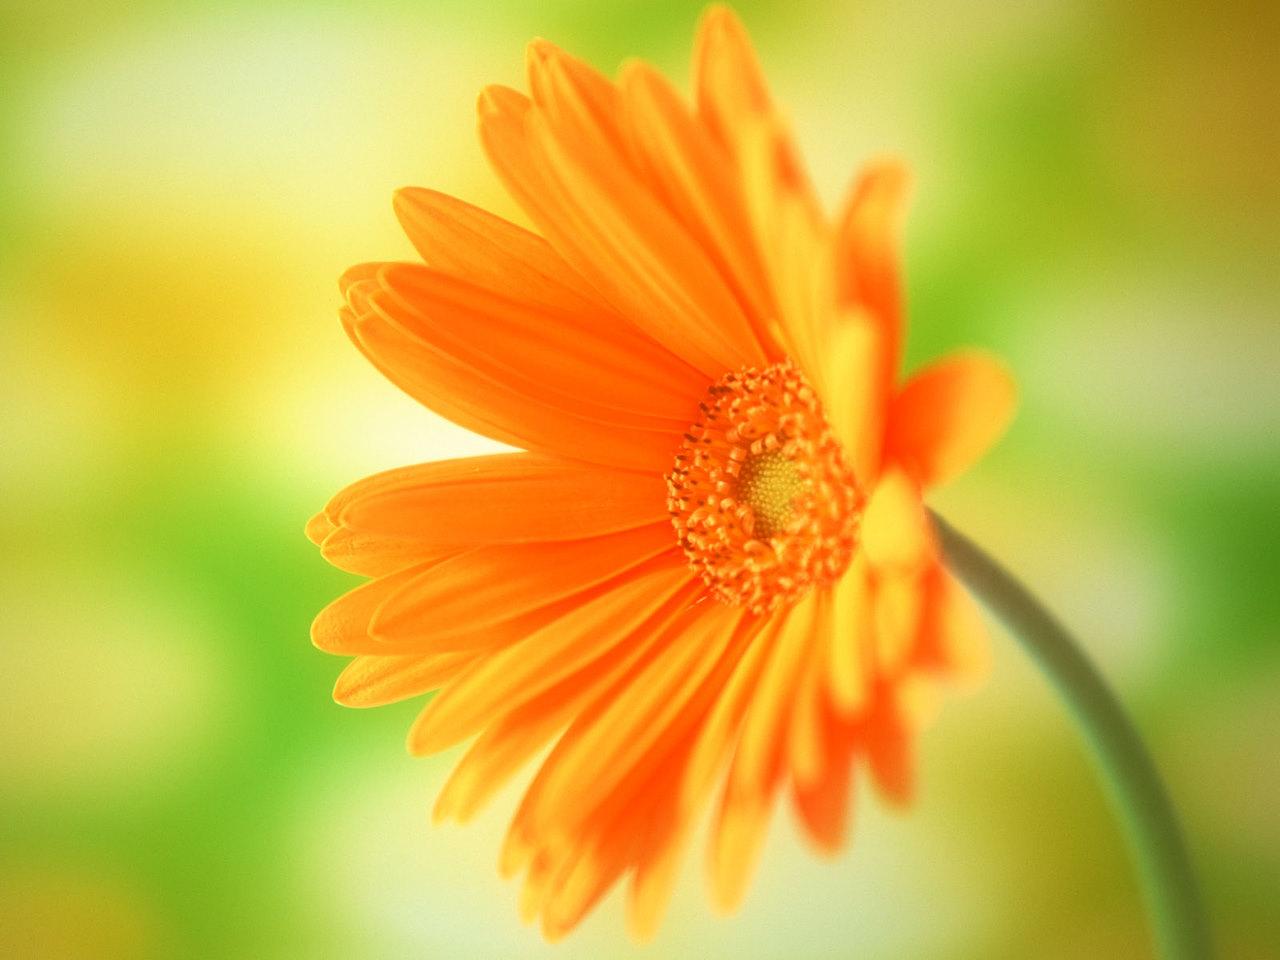 [33+] Spring Daisy Flower Wallpaper on WallpaperSafari